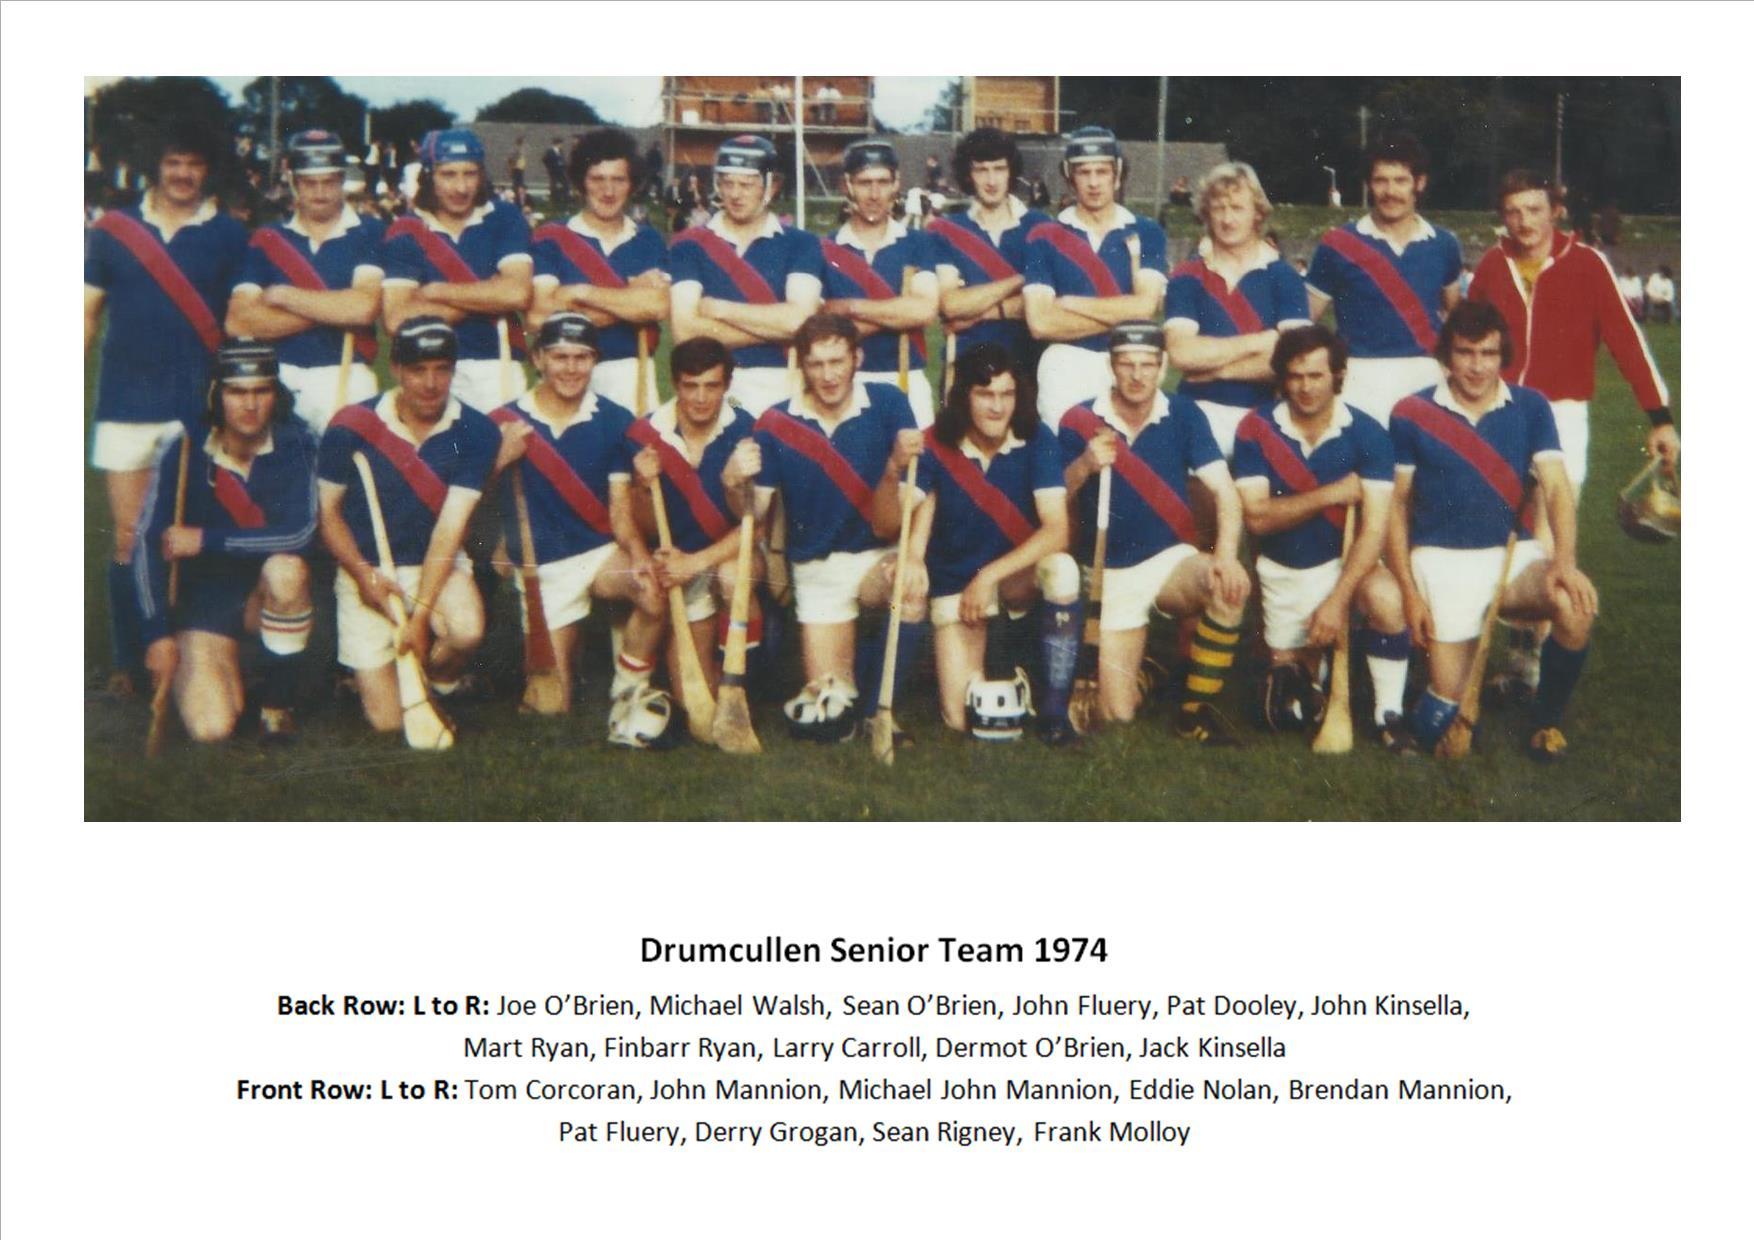 Drumcullen Senior Team - 1974